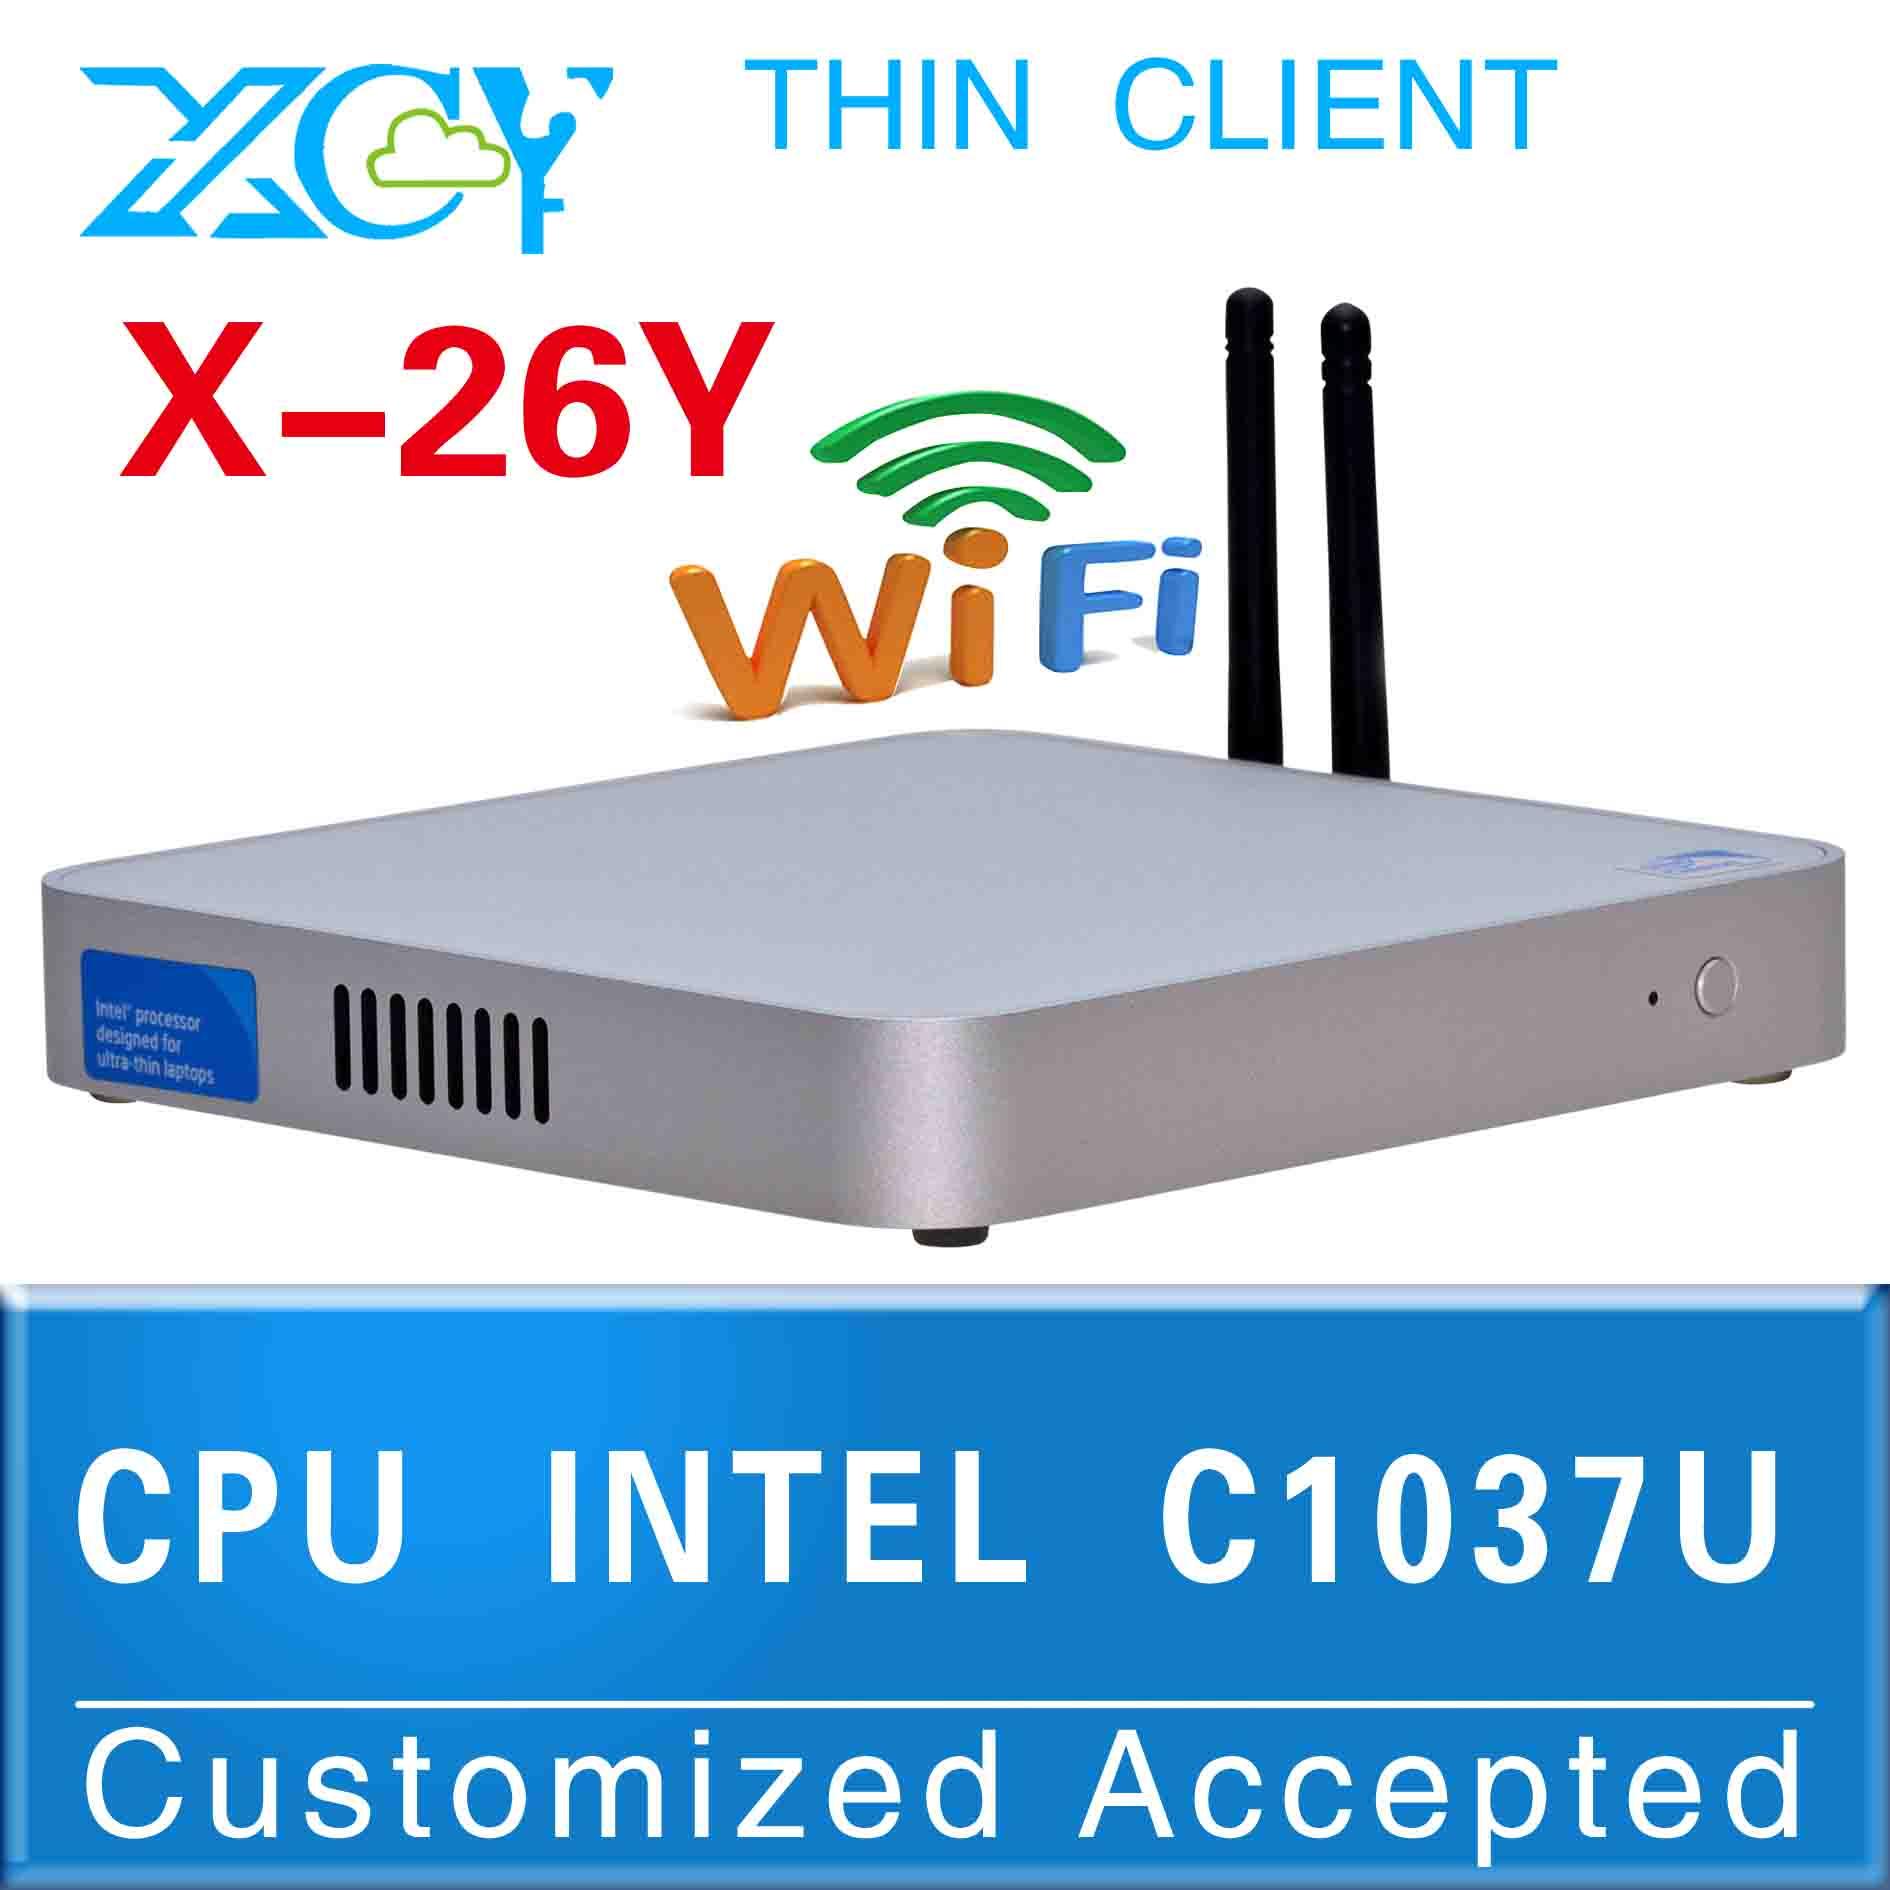 ULP INTEL C1037U X-26Y slim mini itx case atx computer case Mini itx pc cases support video videoconference(China (Mainland))